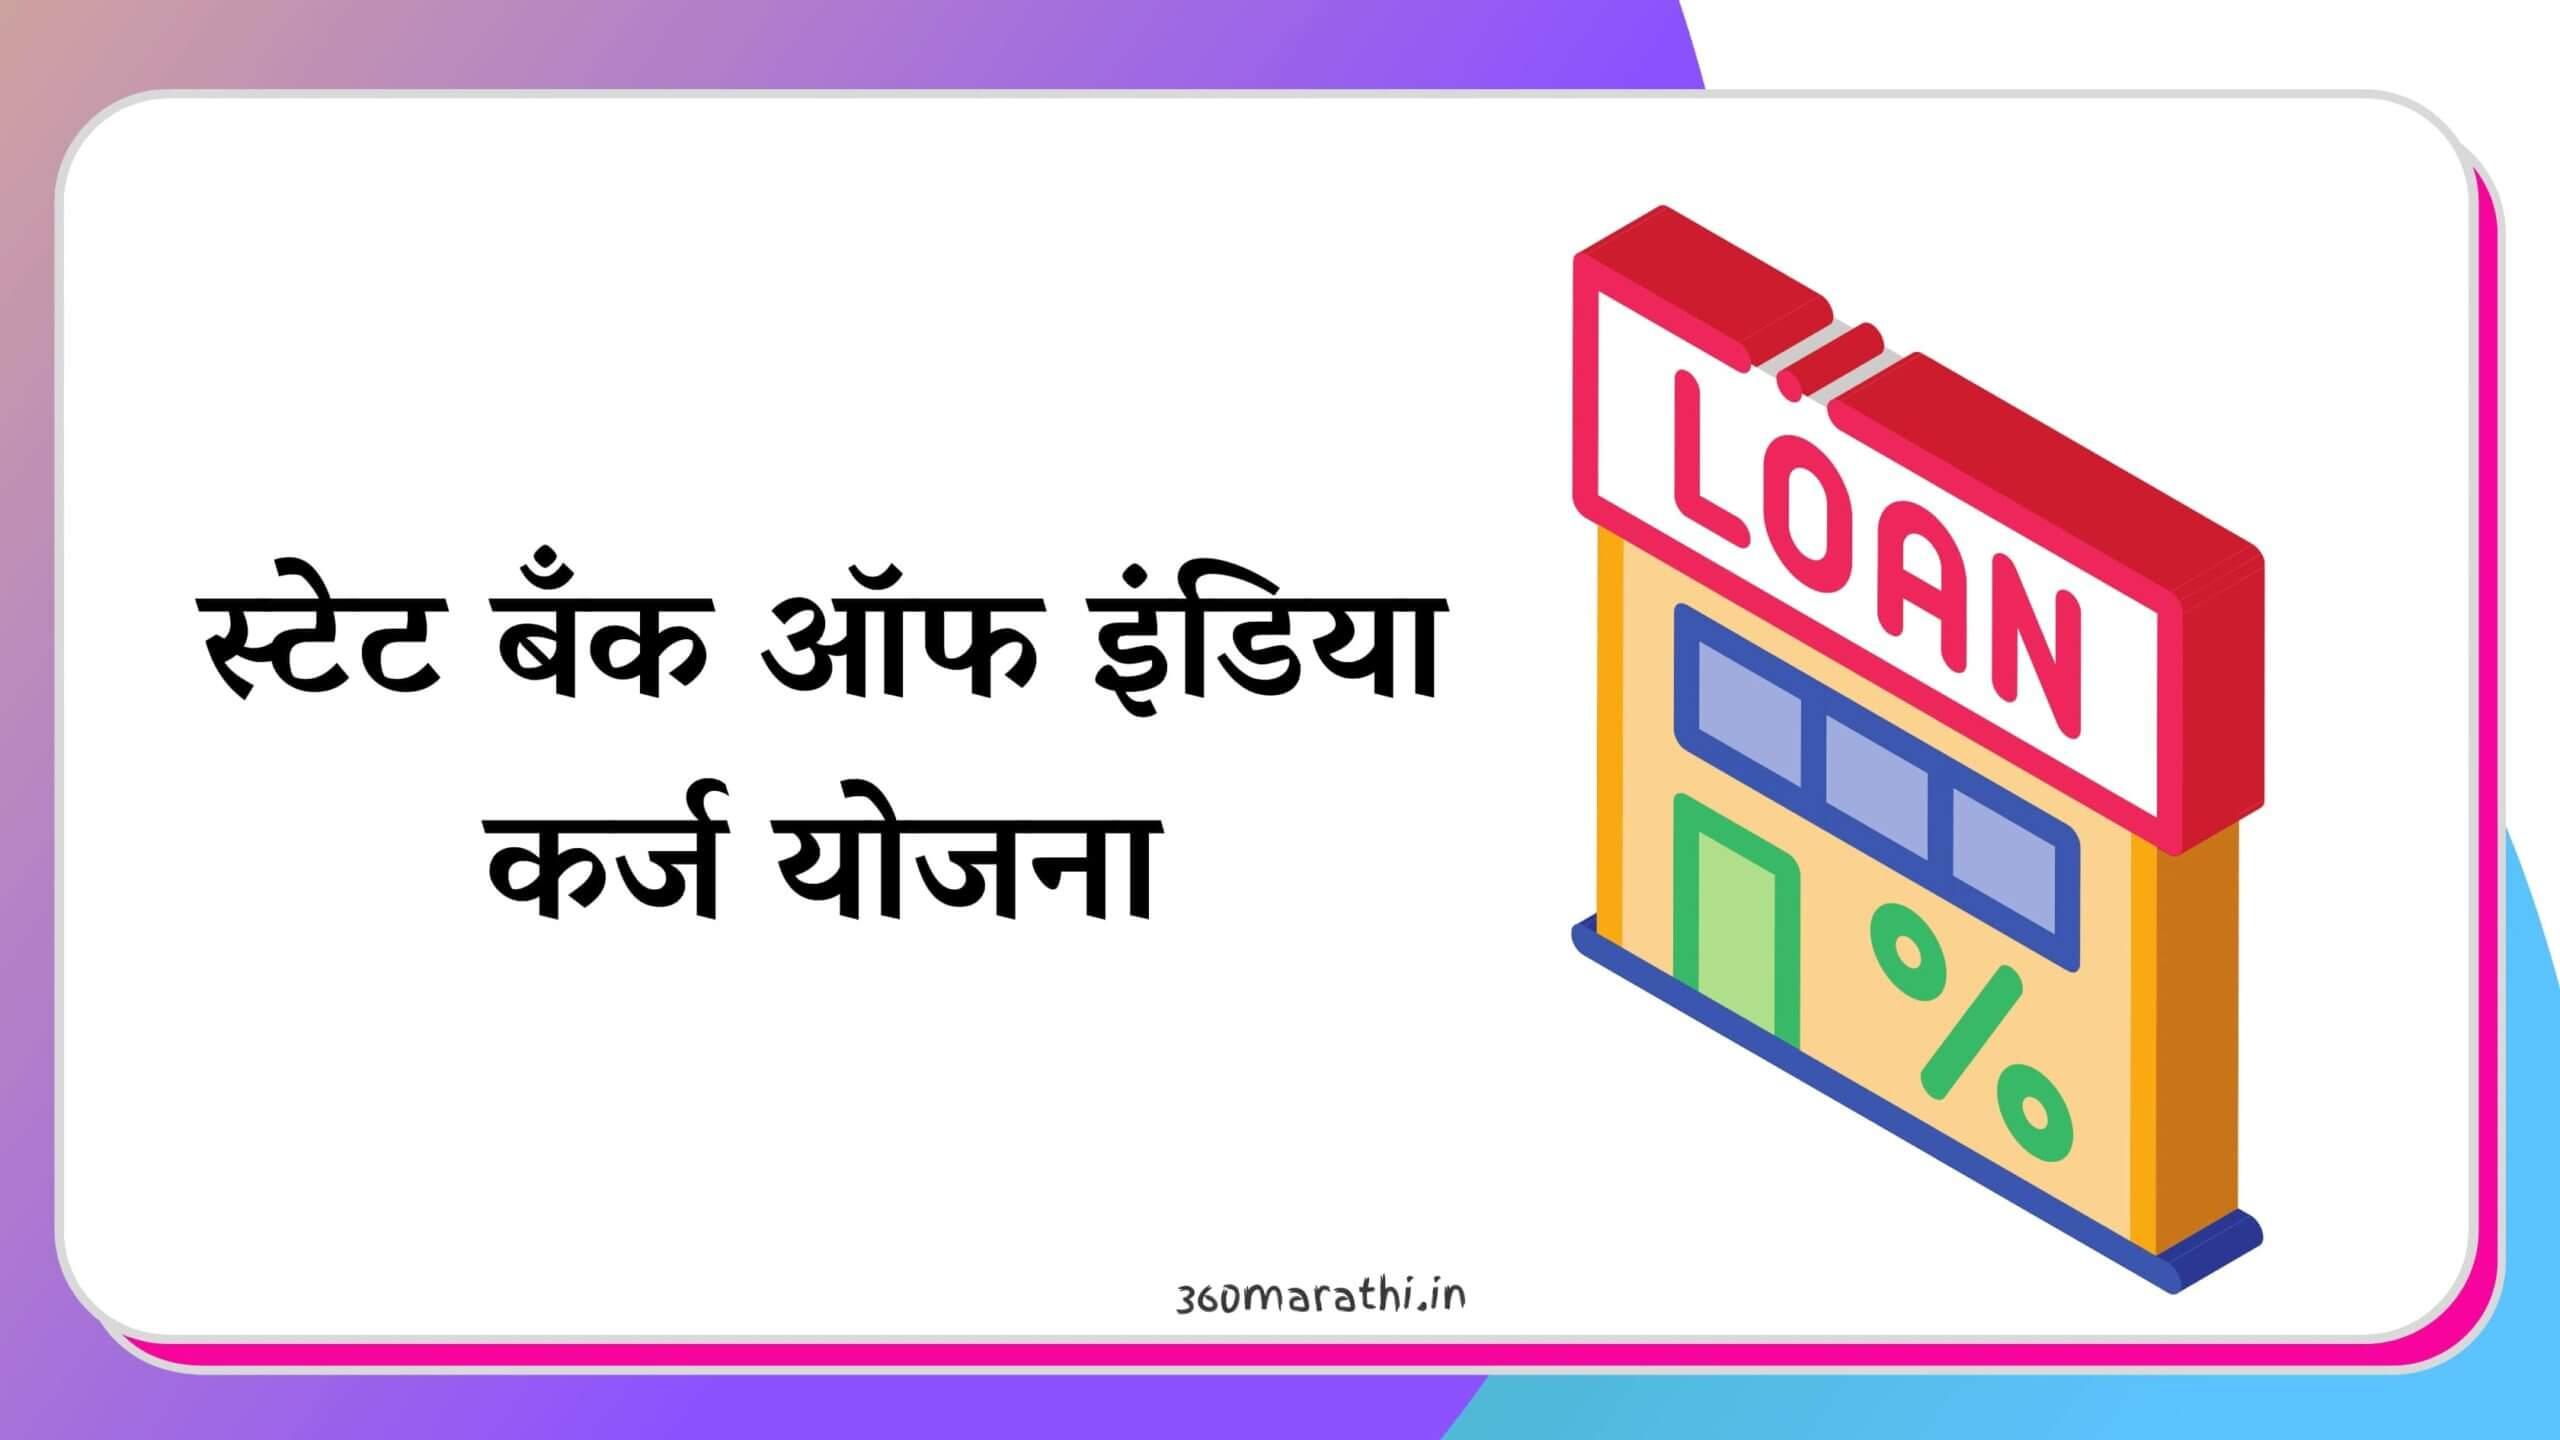 SBI loan Information in Marathi   स्टेट बँक ऑफ इंडिया कर्ज योजना मराठी